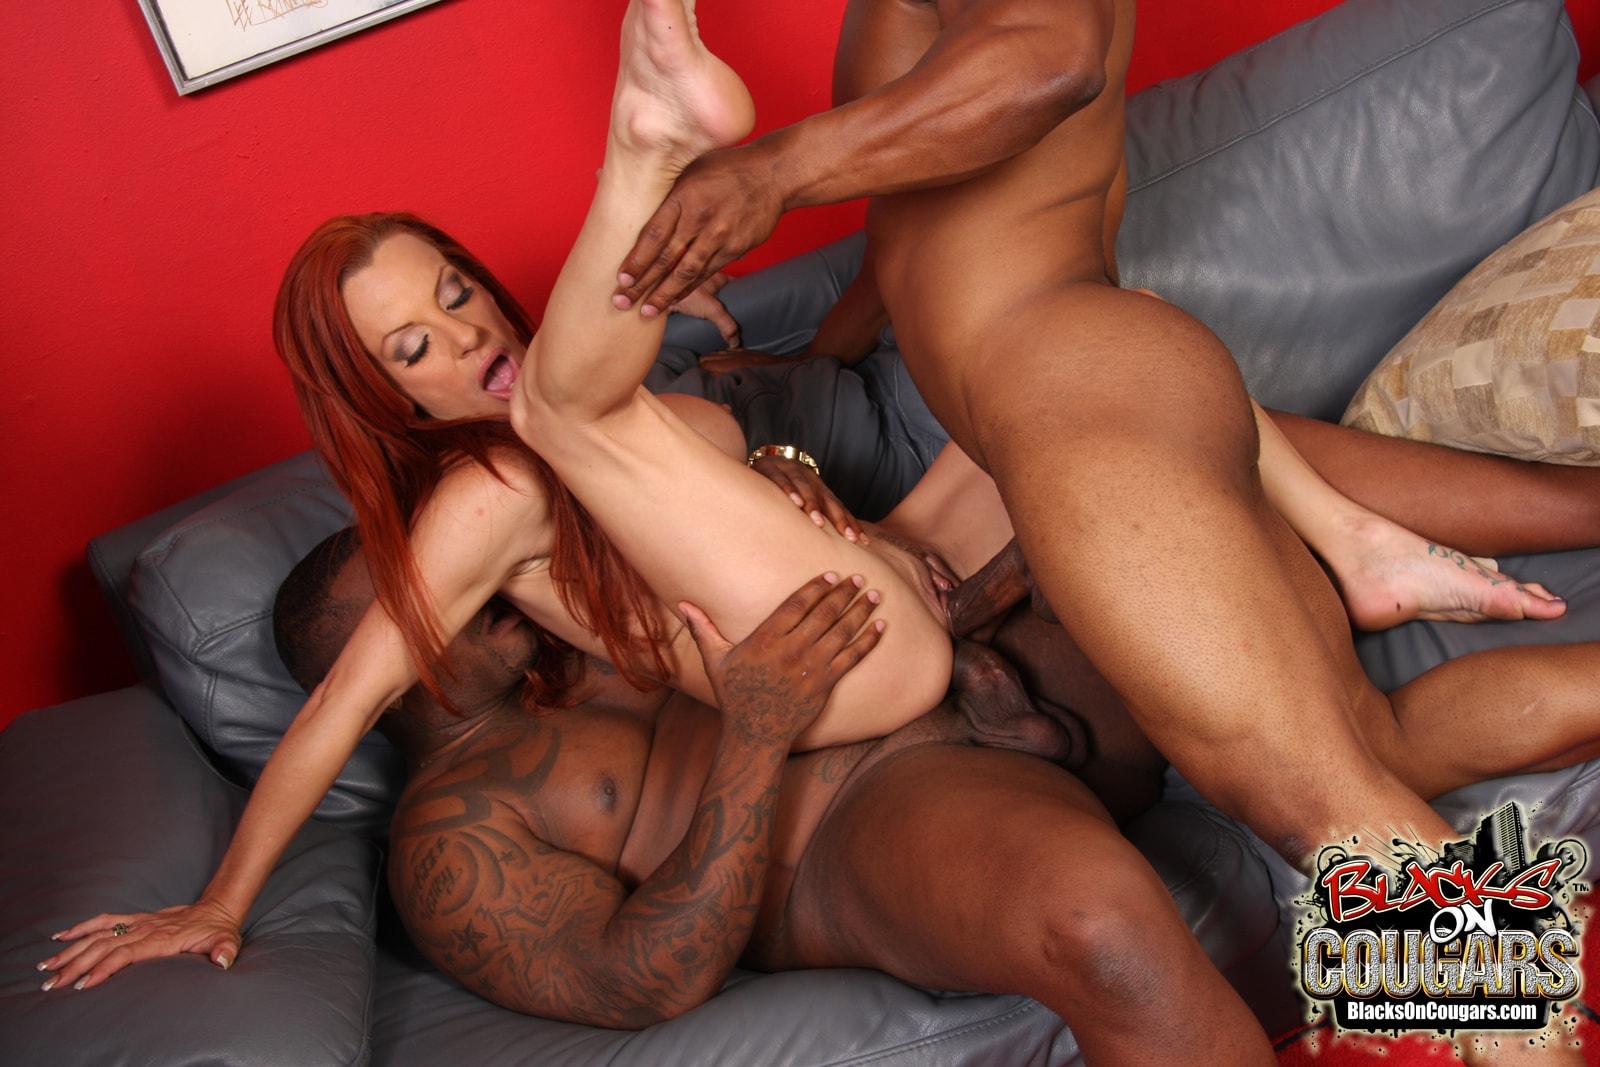 Dogfart '- Blacks On Cougars' starring Shannon Kelly (Photo 27)